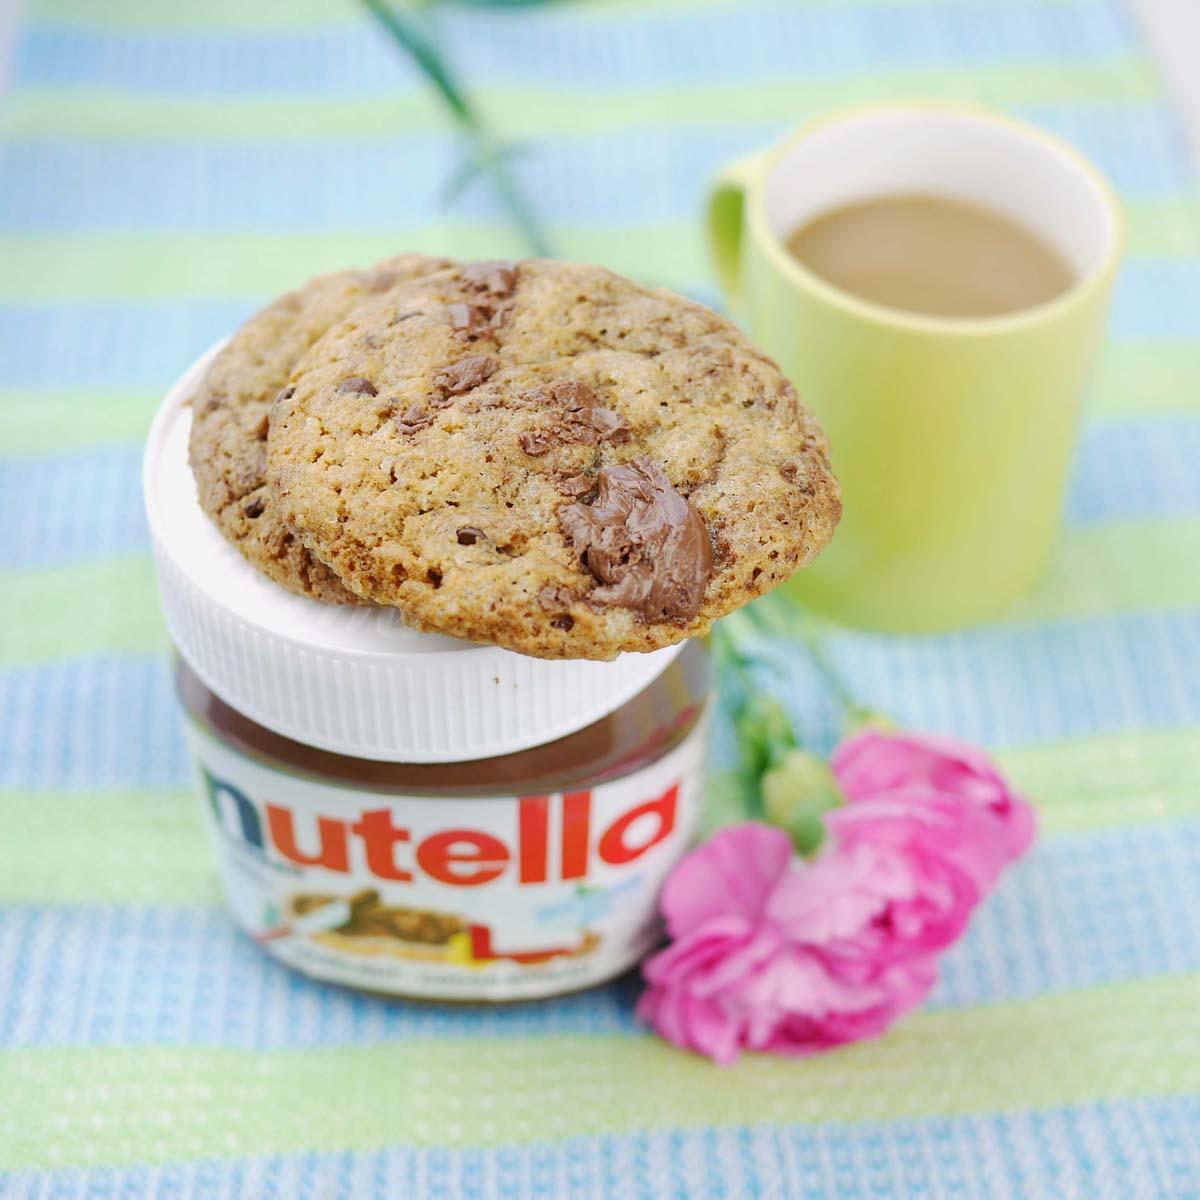 Nutella Chocolate Chip Cookies | Crustabakes